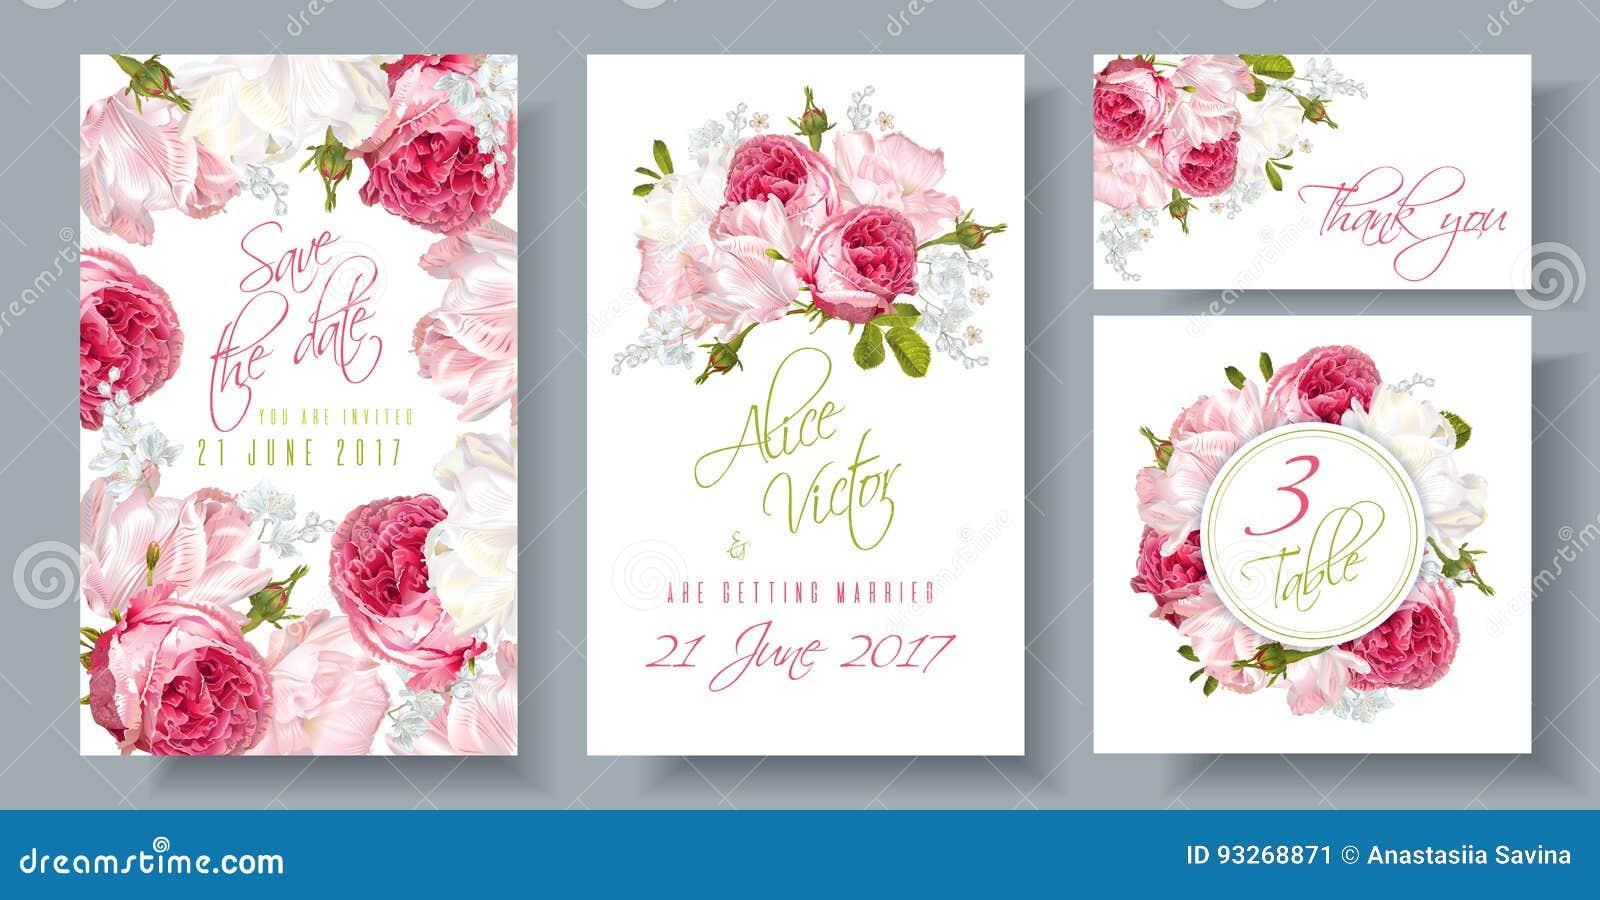 Vector Wedding Invitations: Rose Wedding Invitation Stock Vector. Illustration Of Date